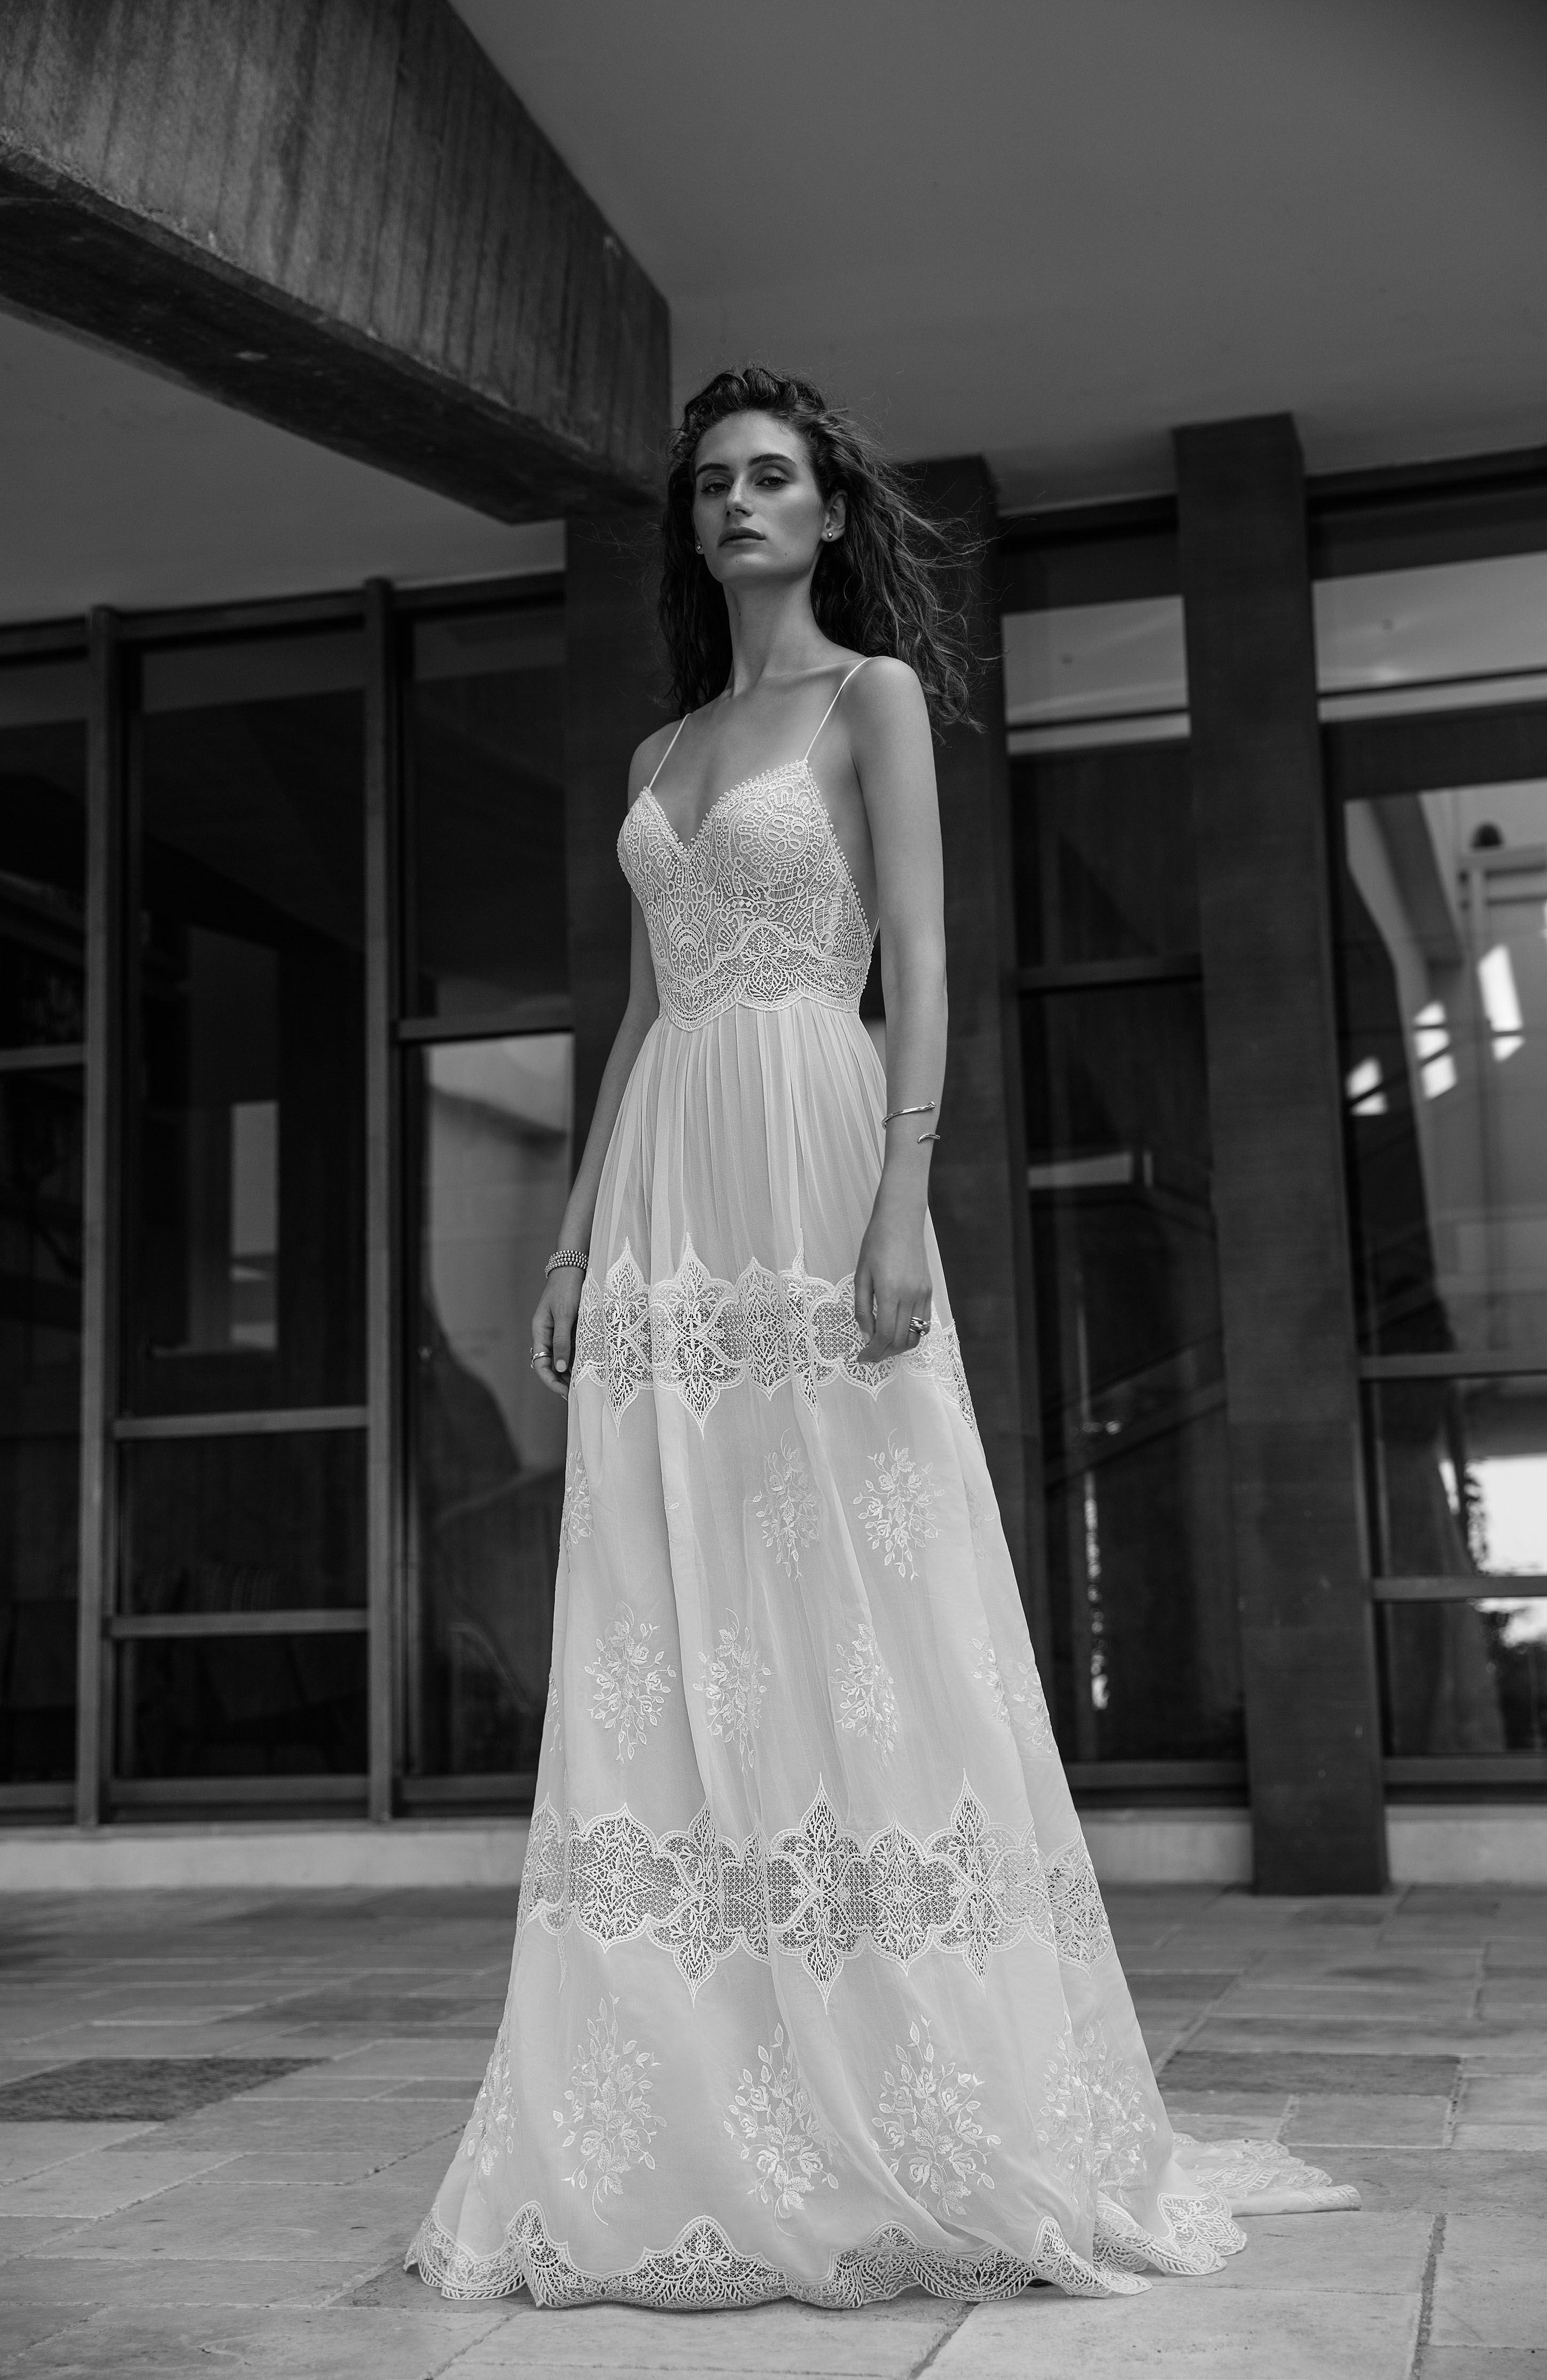 Eva By Flora Vintage Lace Open Back Boho Chic Wedding Dress Spaghetti Straps